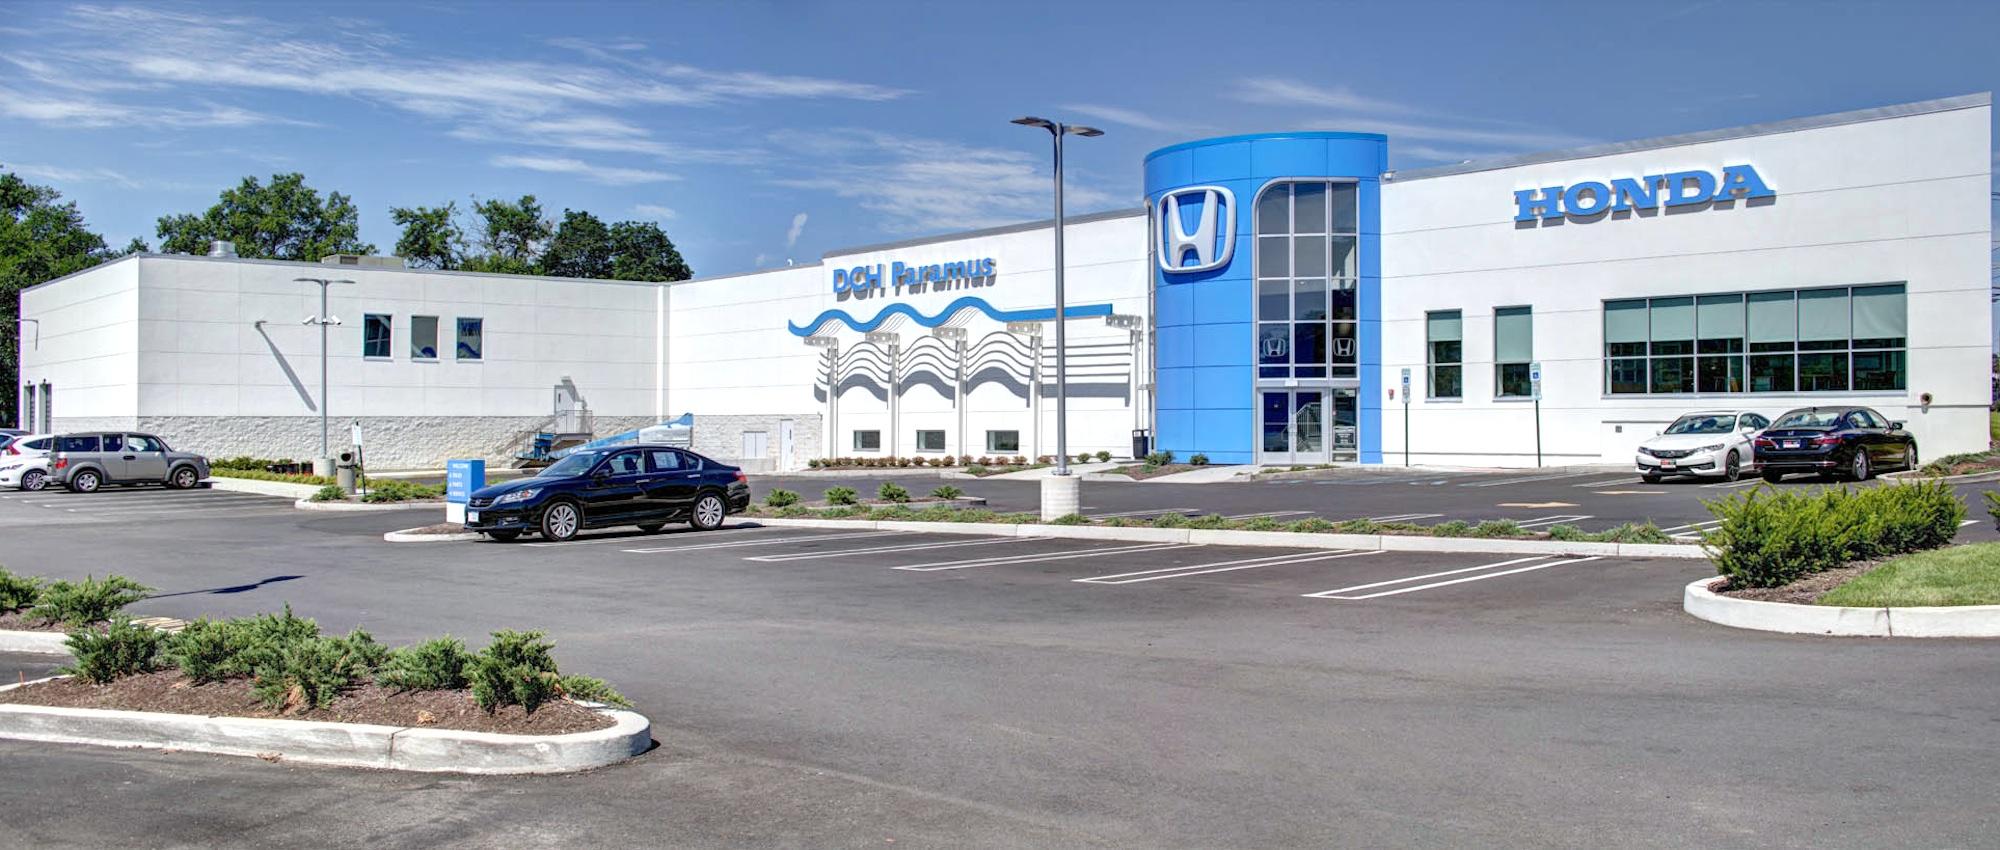 Dch Honda Dealership